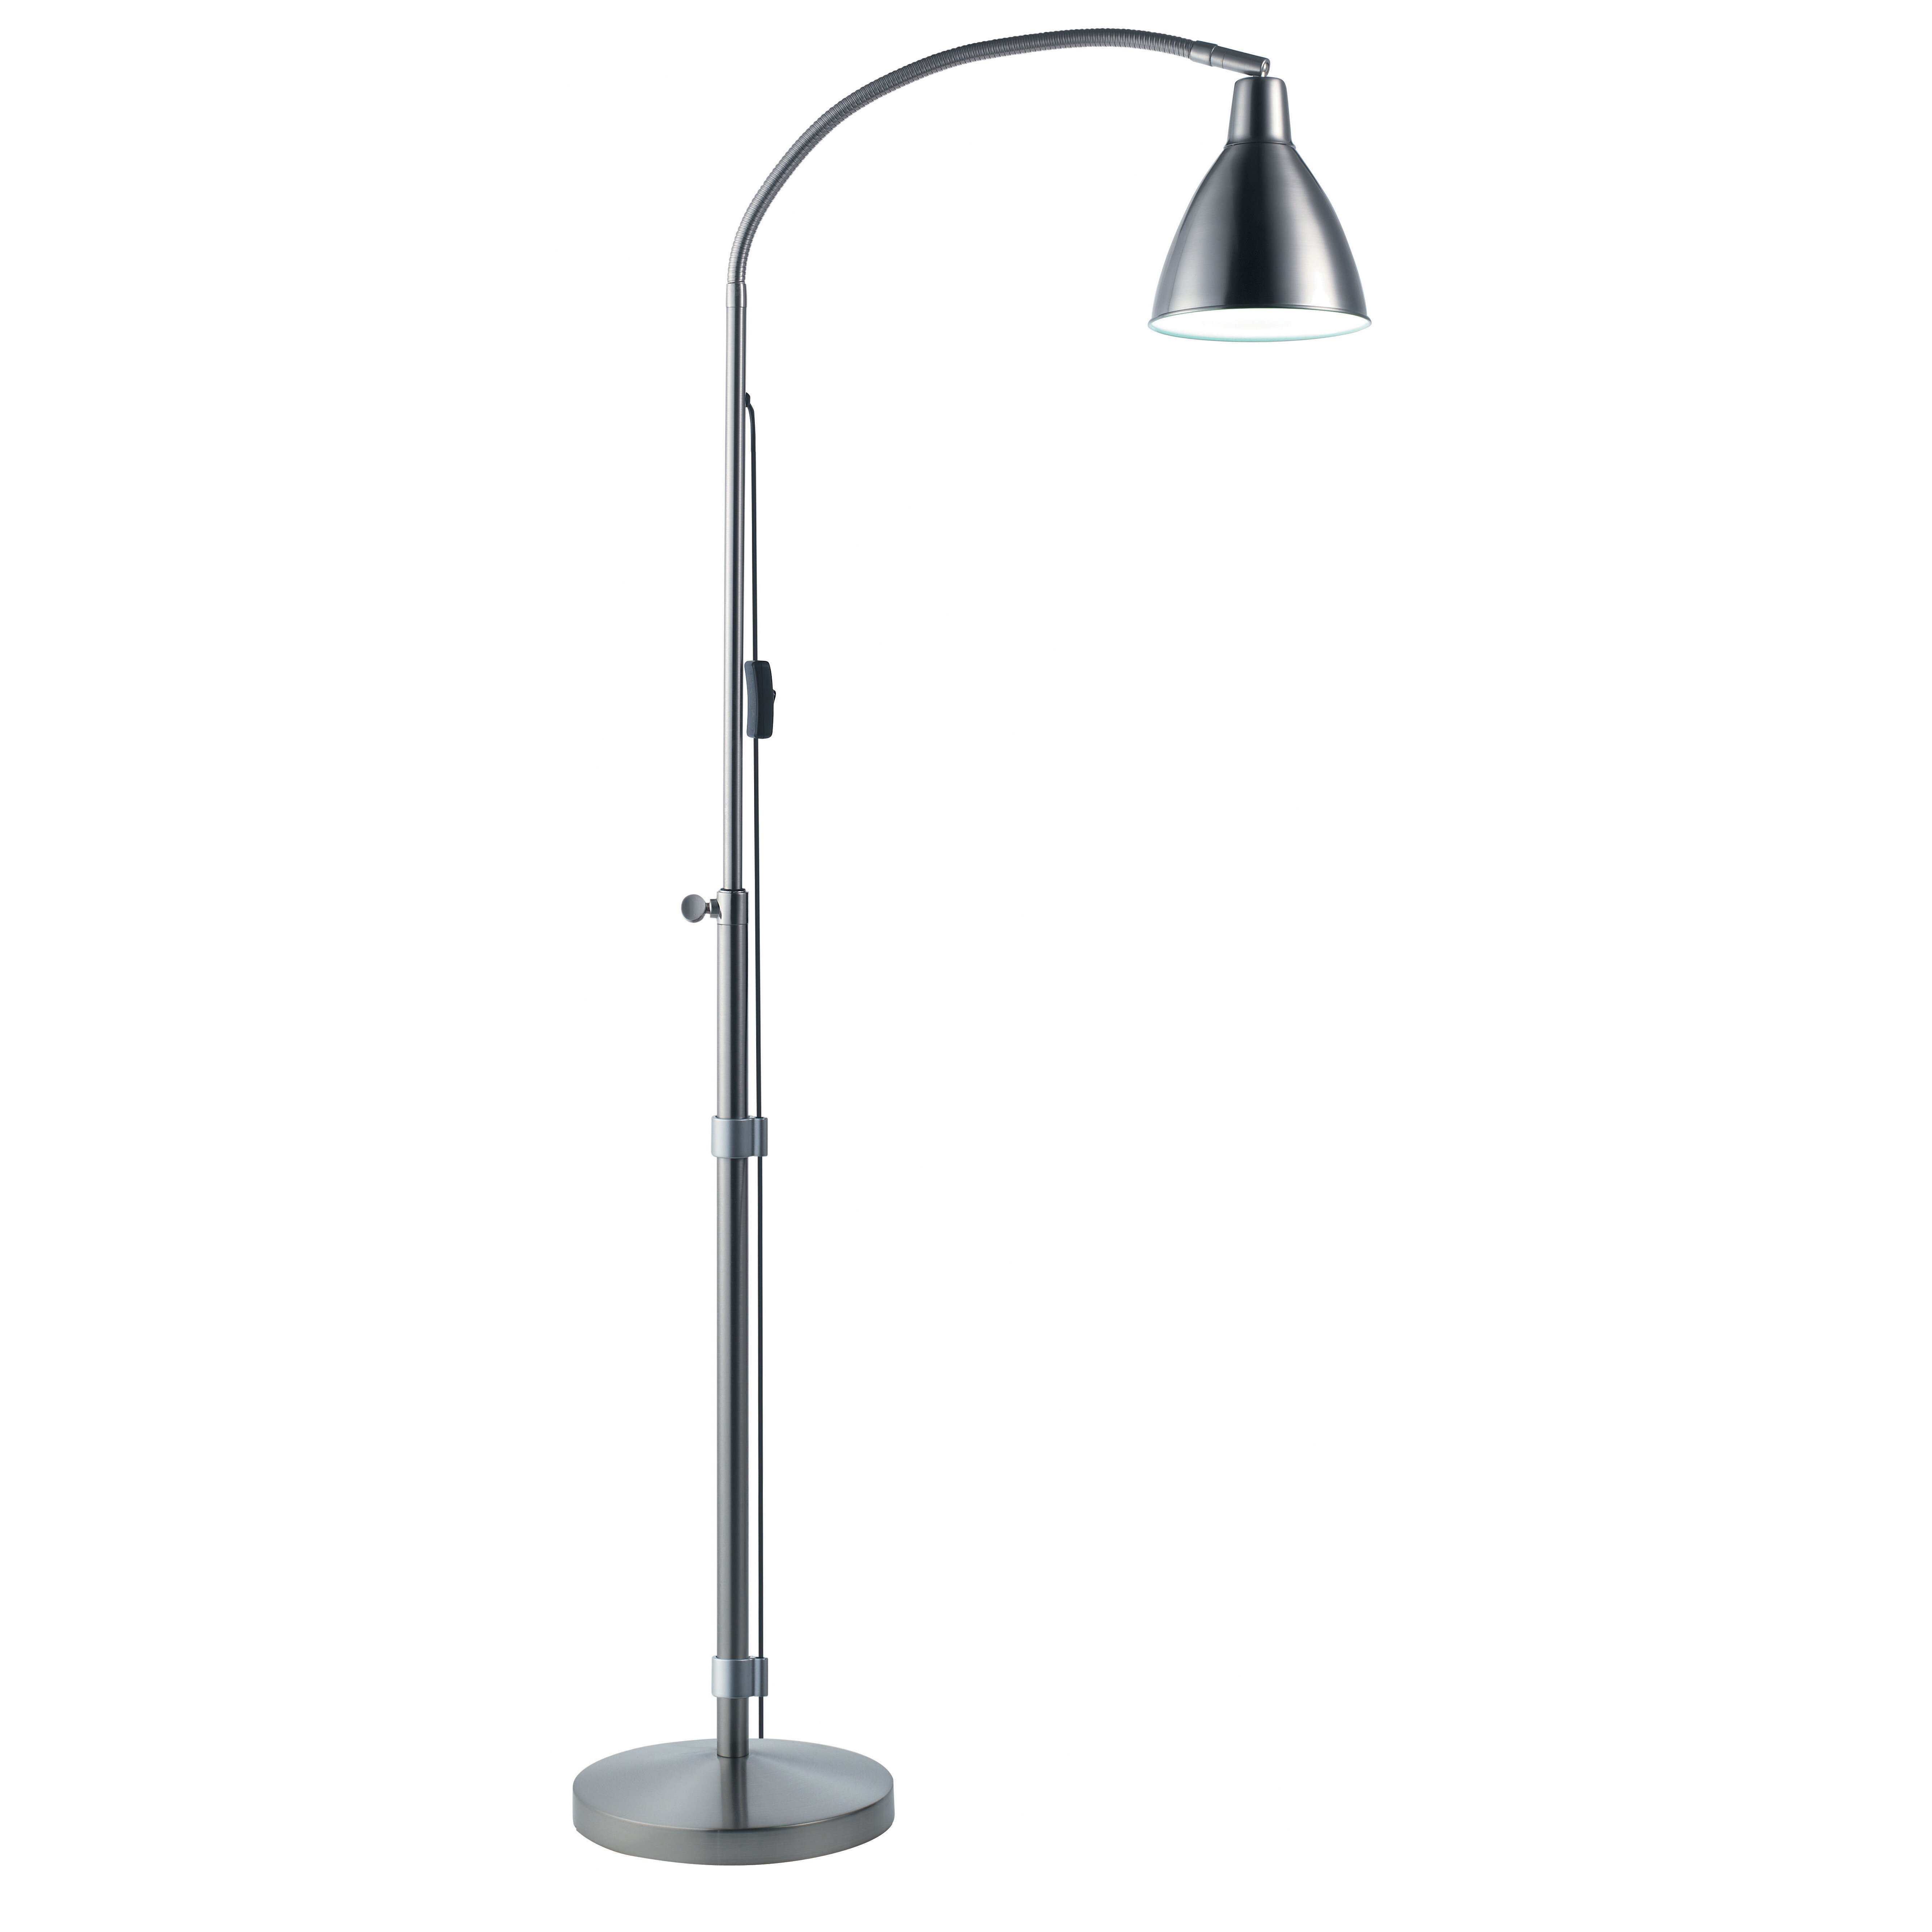 Daylight Company Flexi Vision 50 Quot Task Floor Lamp